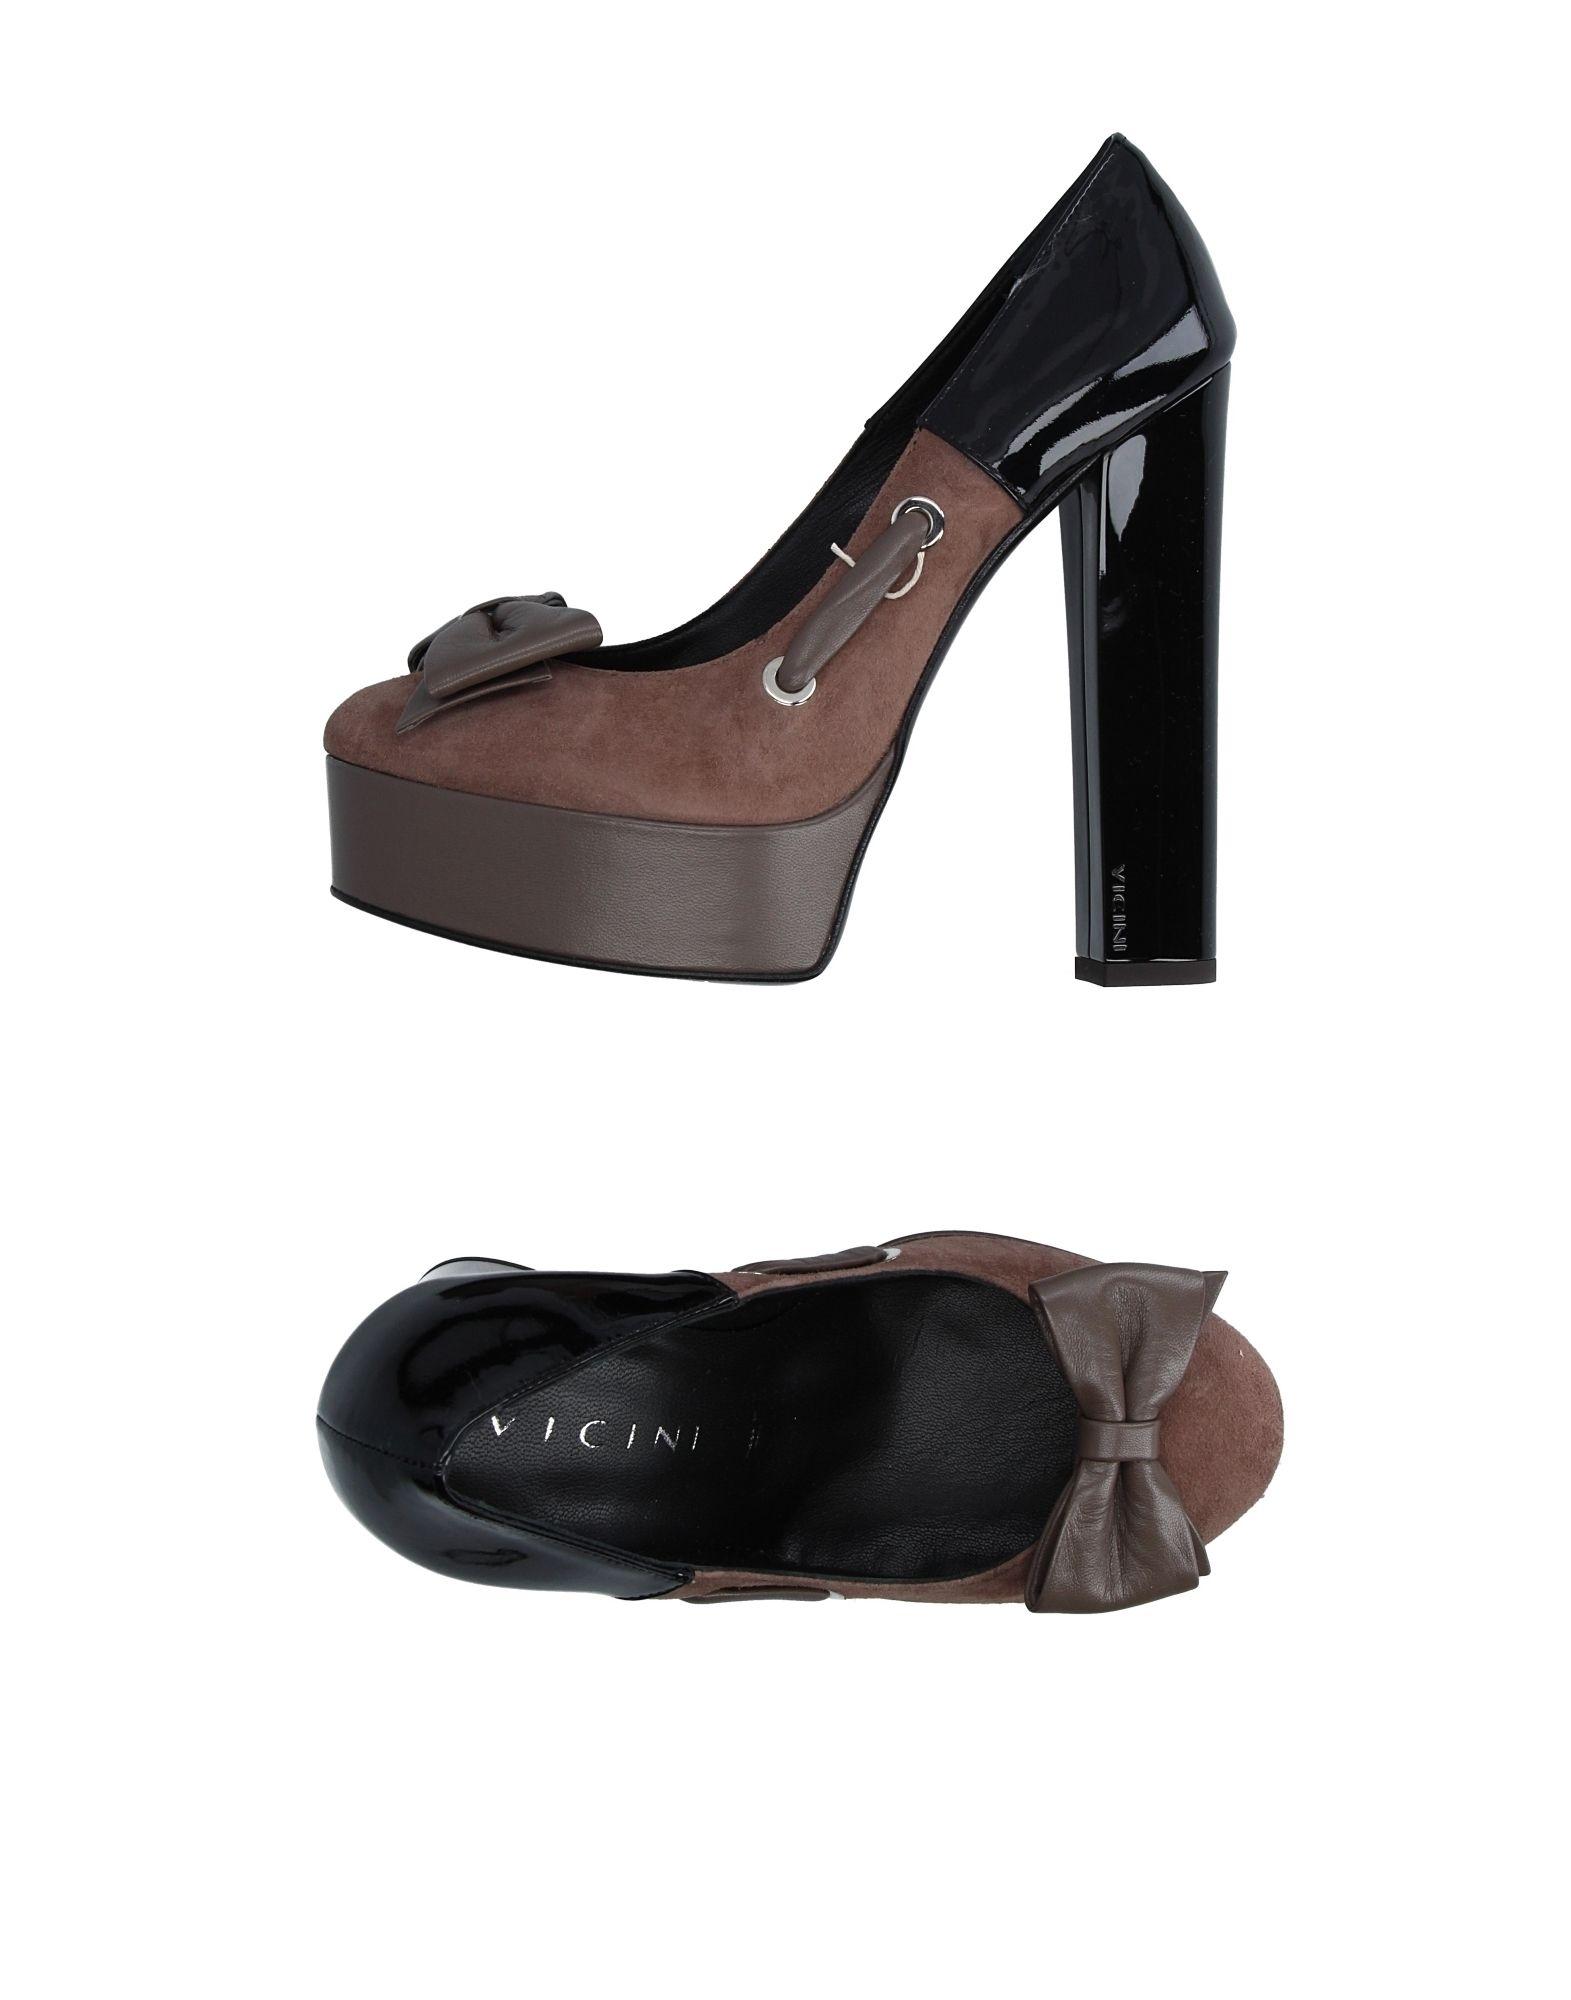 Stilvolle billige Schuhe Vicini Pumps 11311833PV Damen  11311833PV Pumps 9bde6a